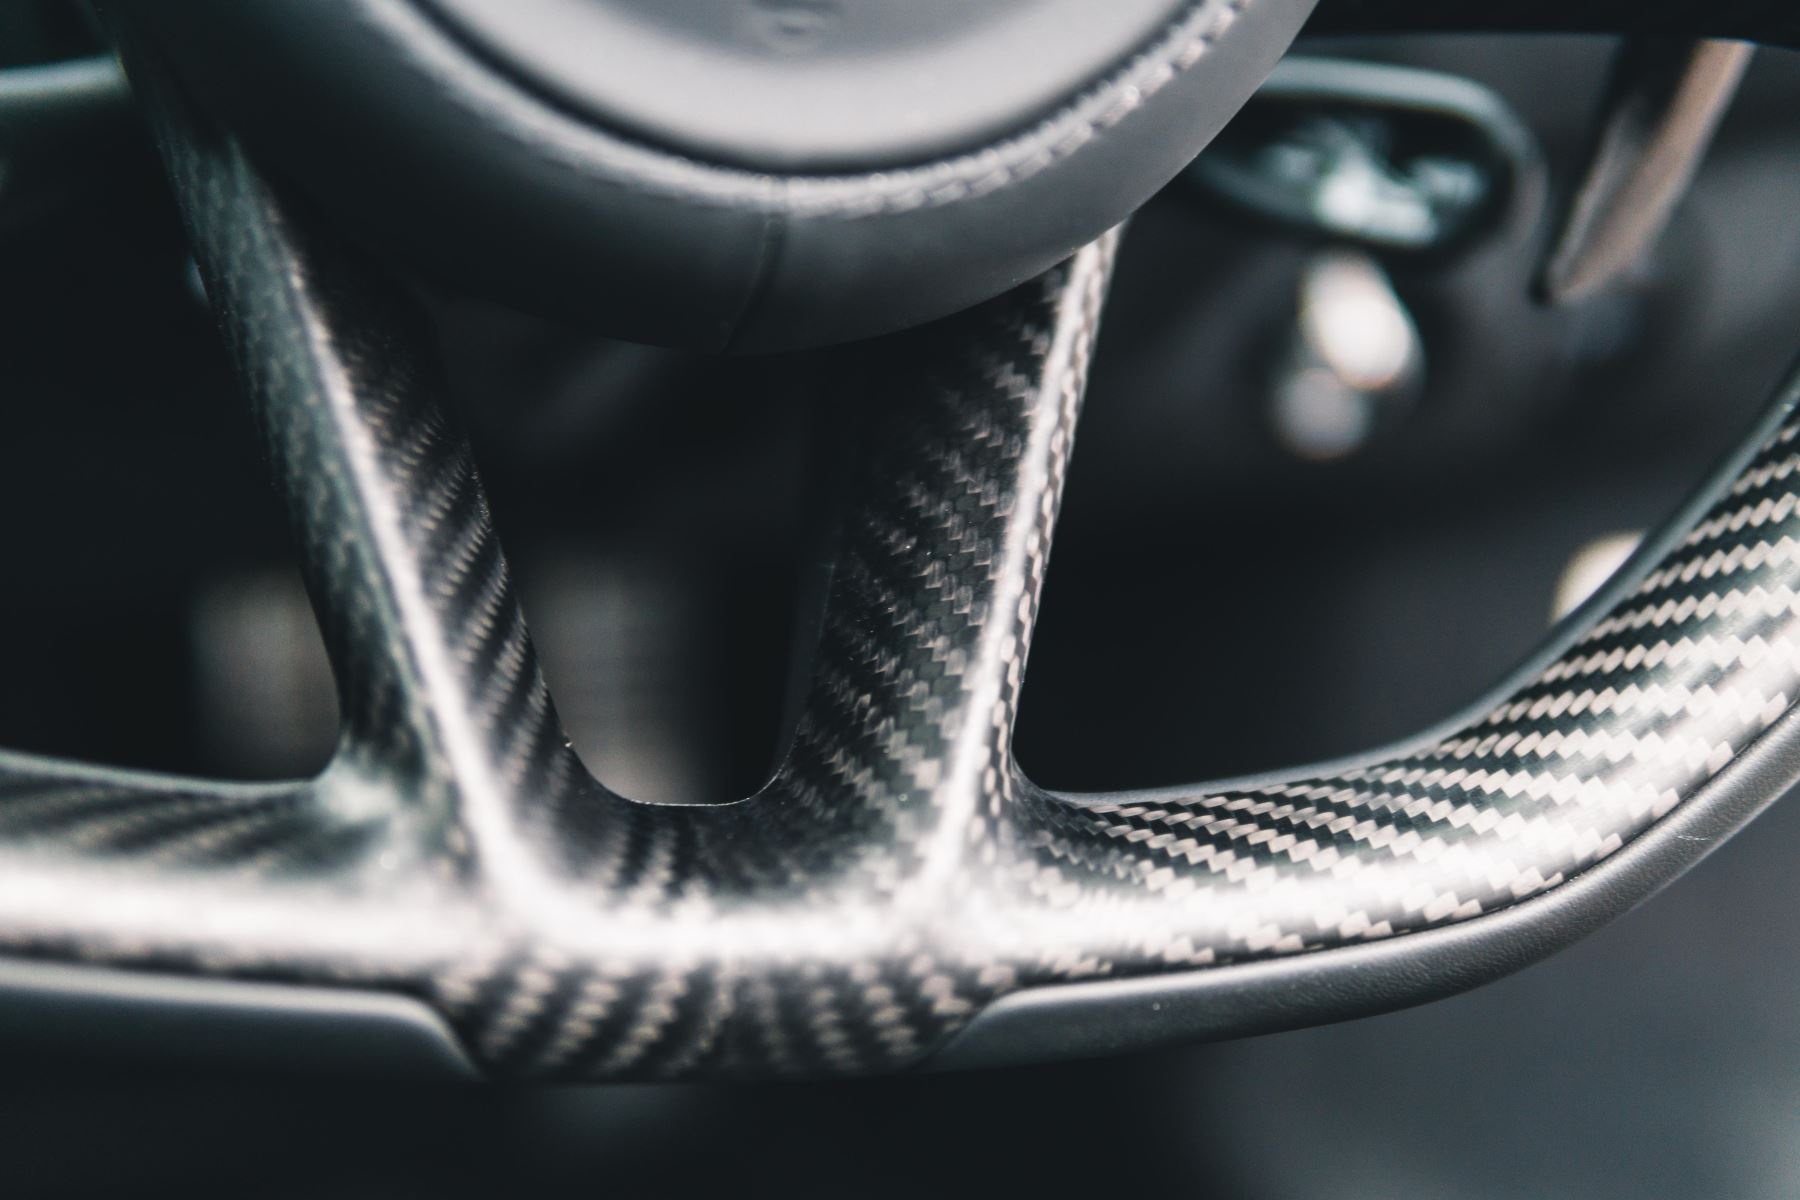 McLaren 720S Performance V8 Coupe SSG image 36